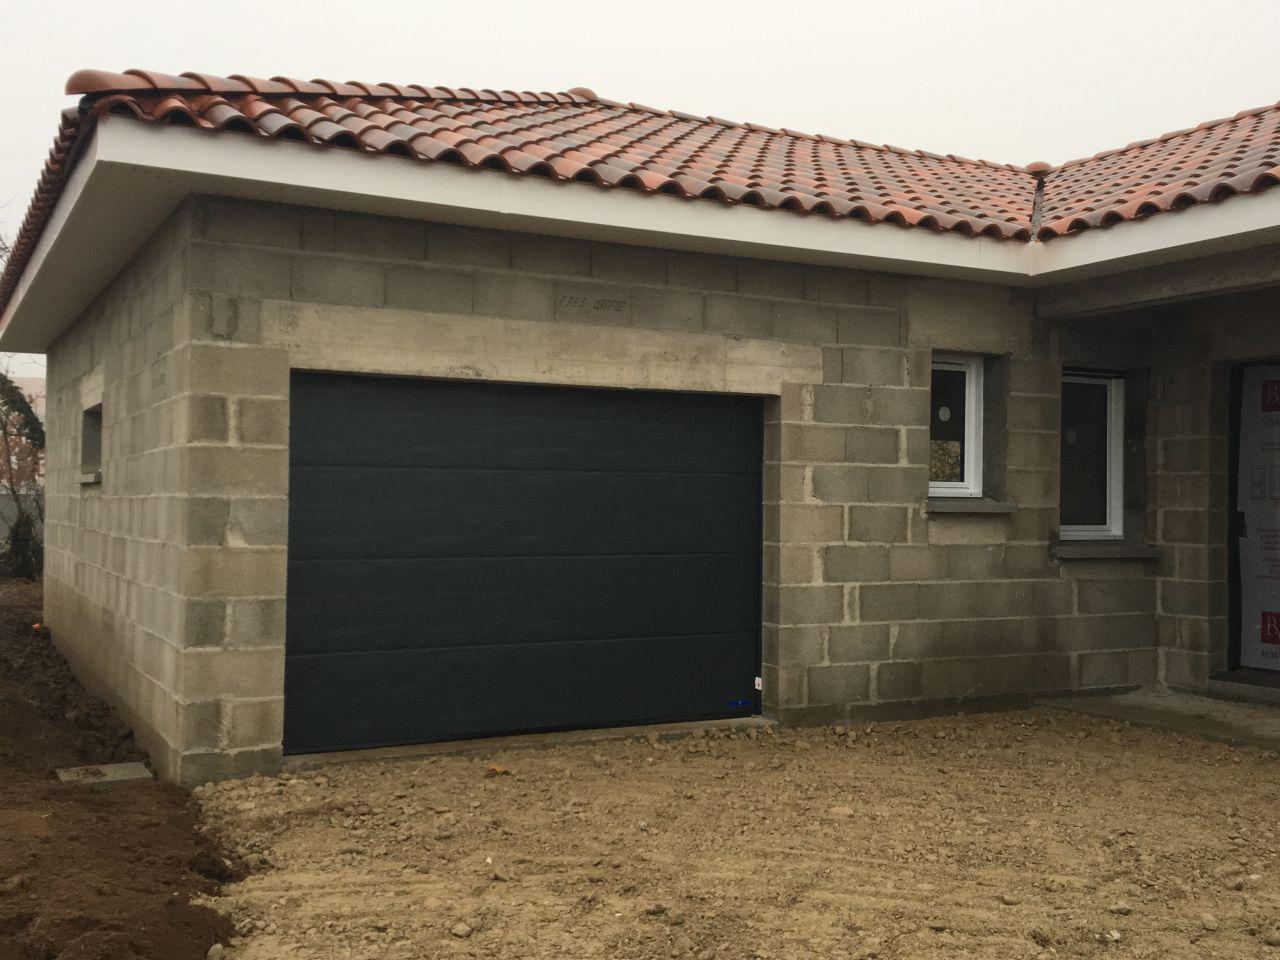 Porte de garage 3 mètres motorisée